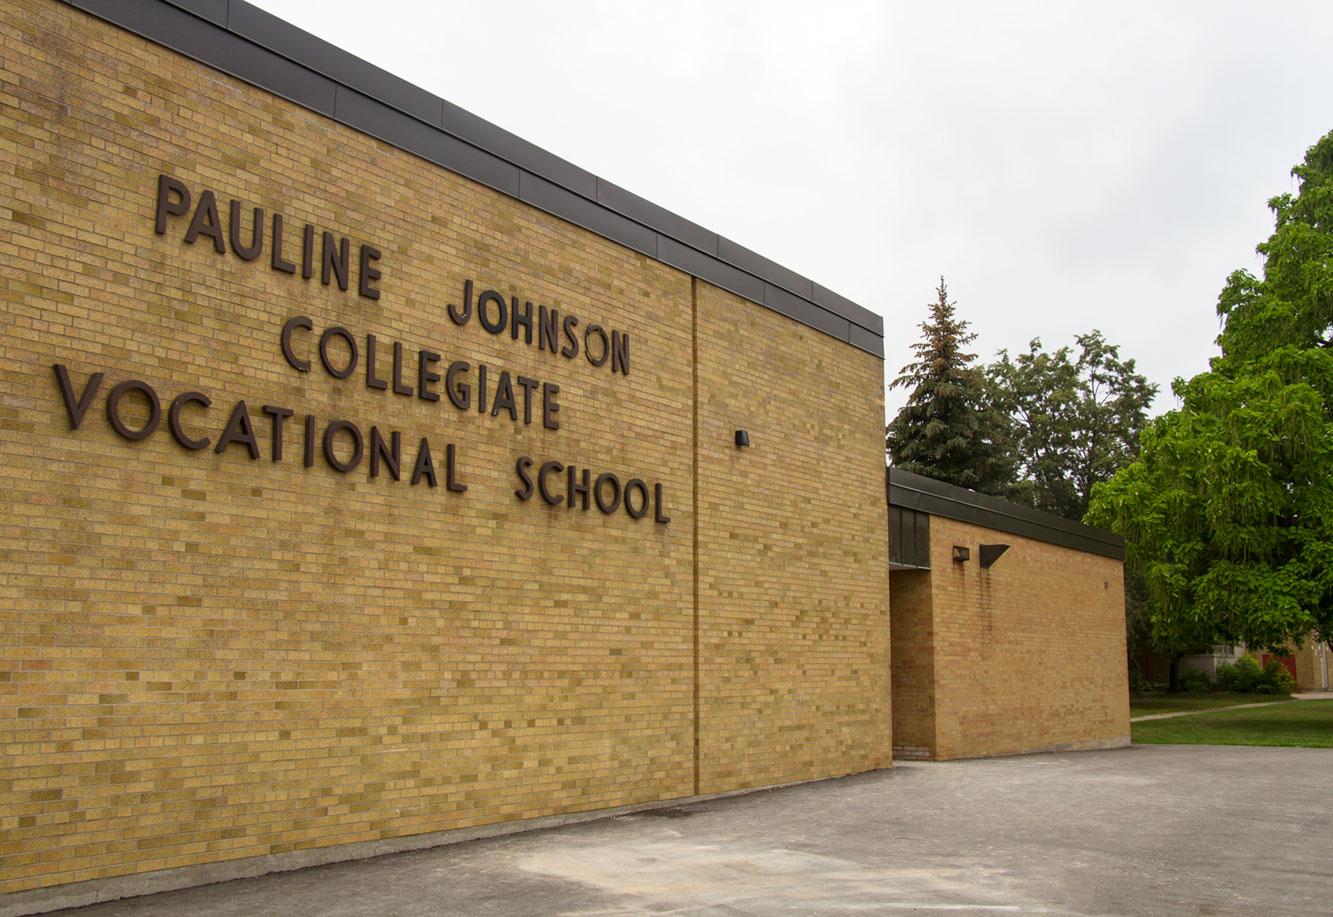 Pauline Johnson Collegiate and Vocational School